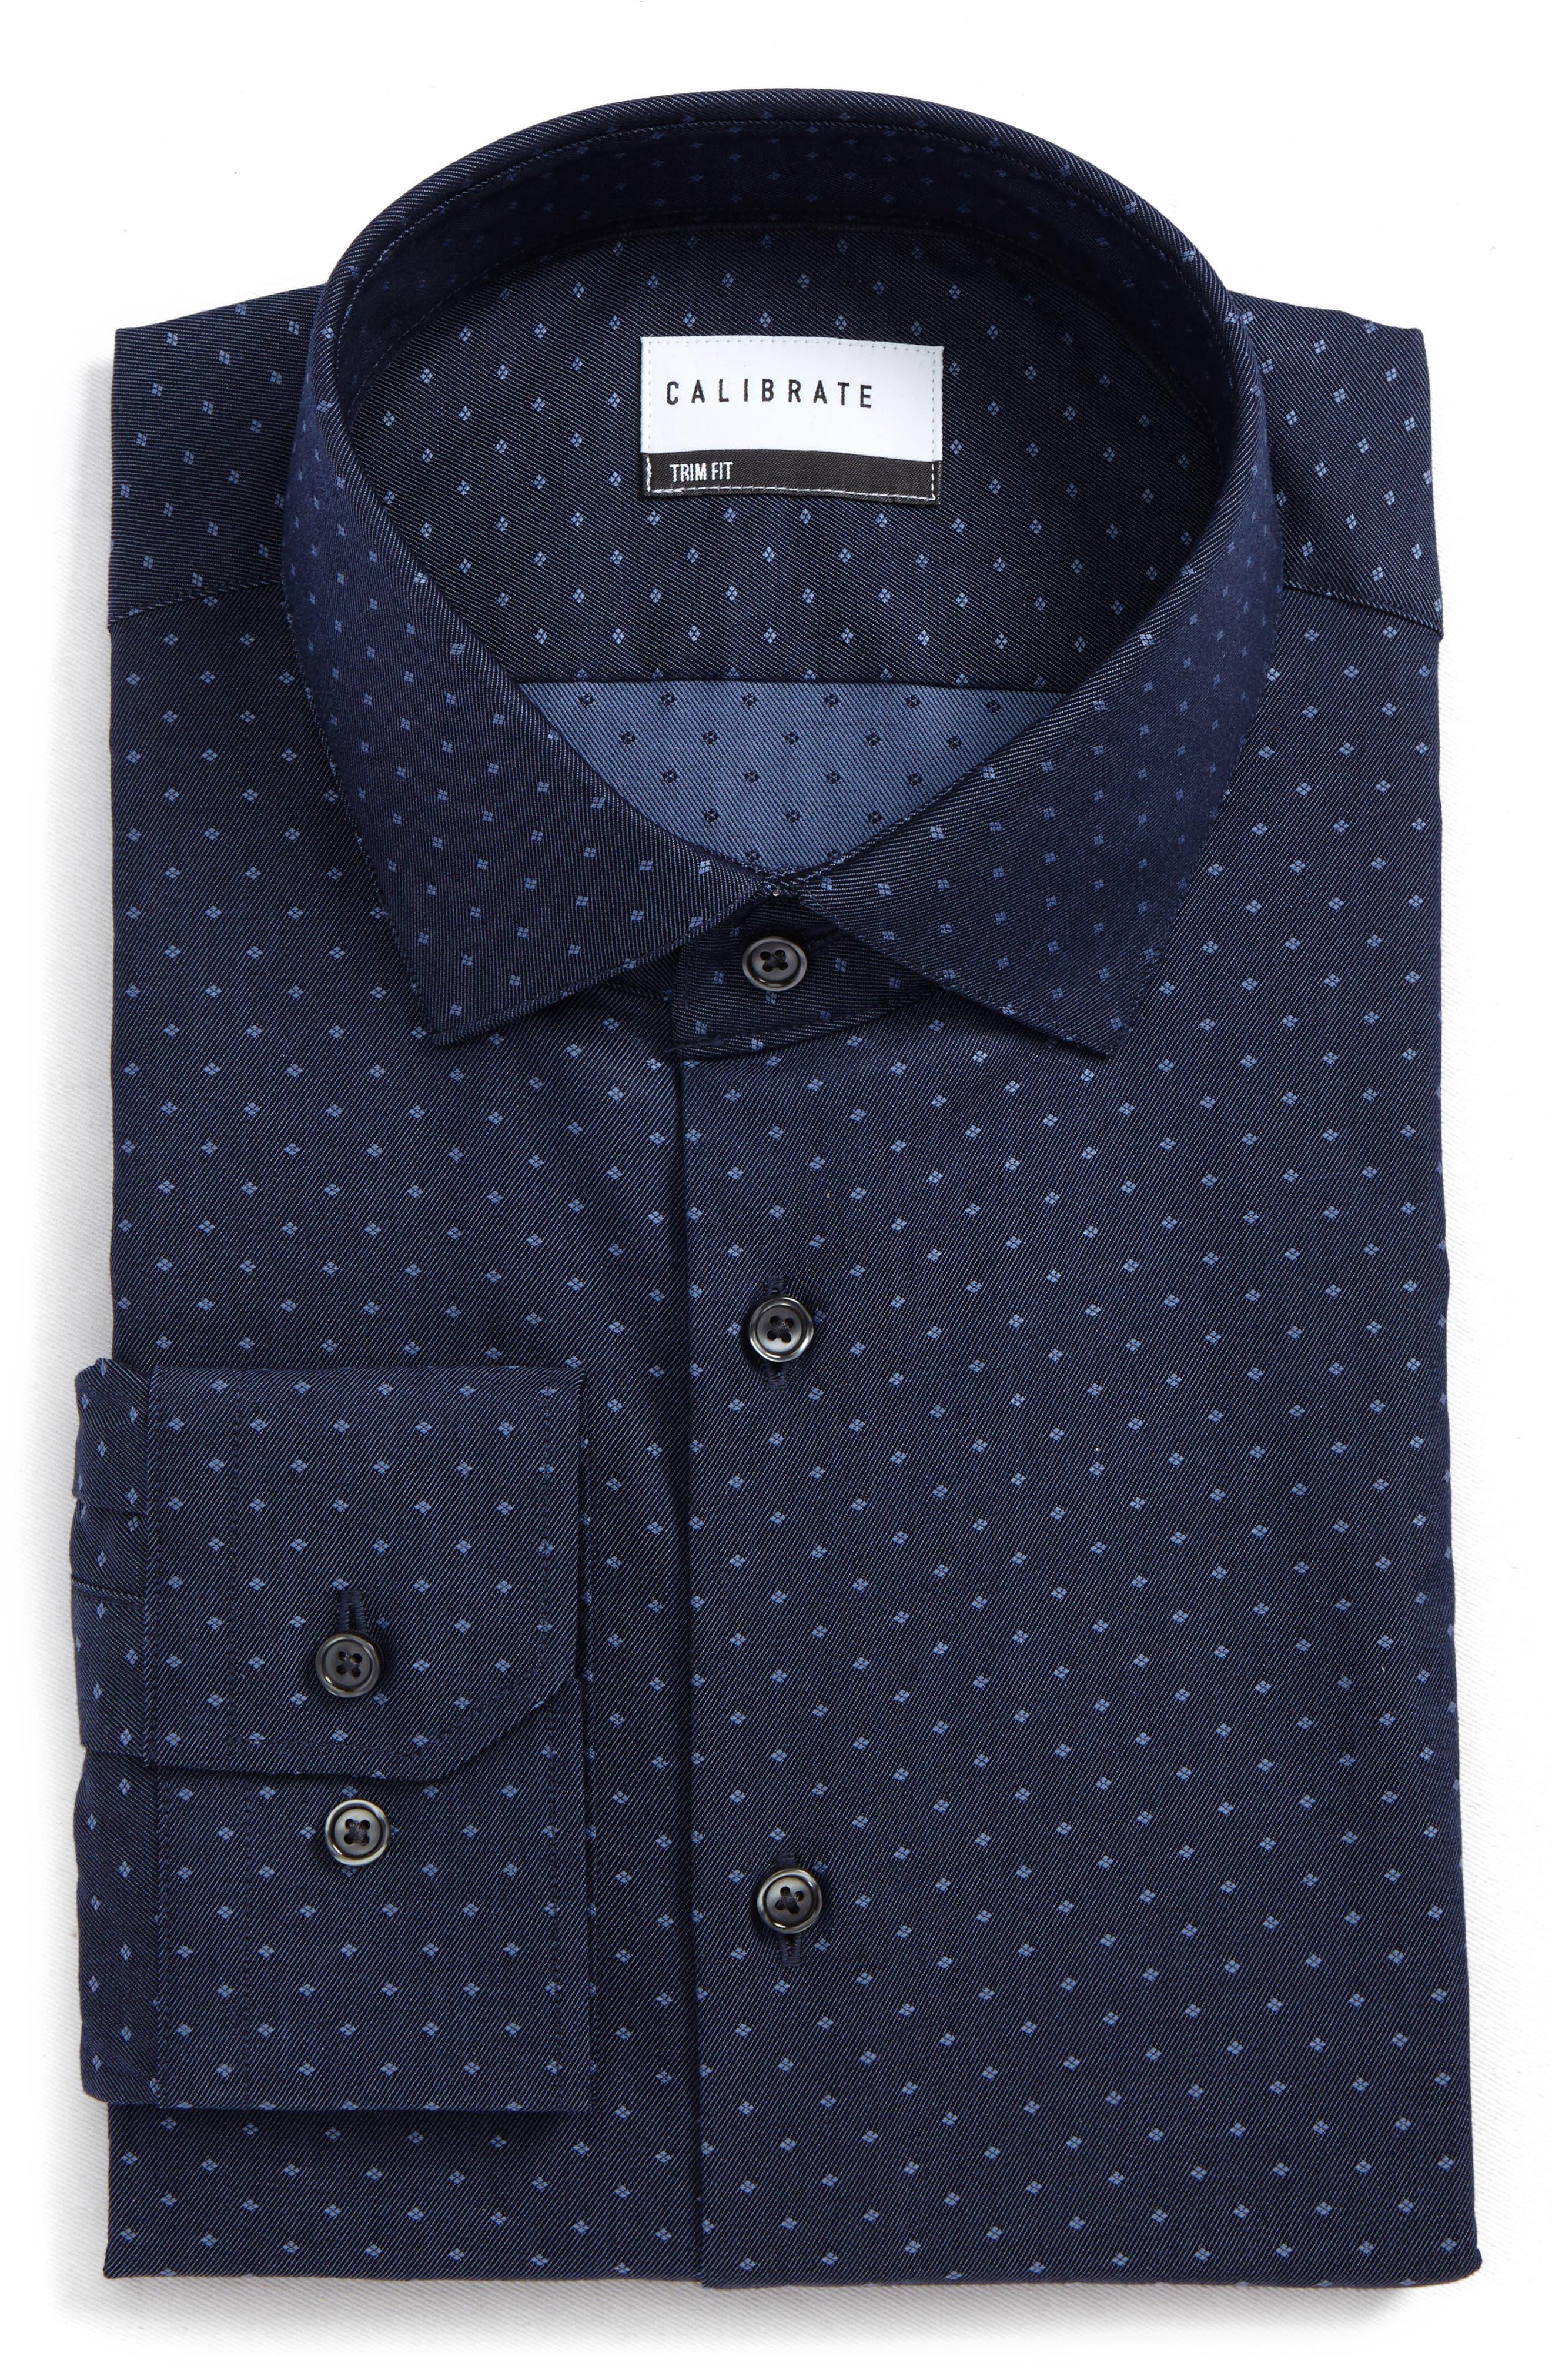 Main Image - Calibrate Trim Fit Jacquard Dress Shirt